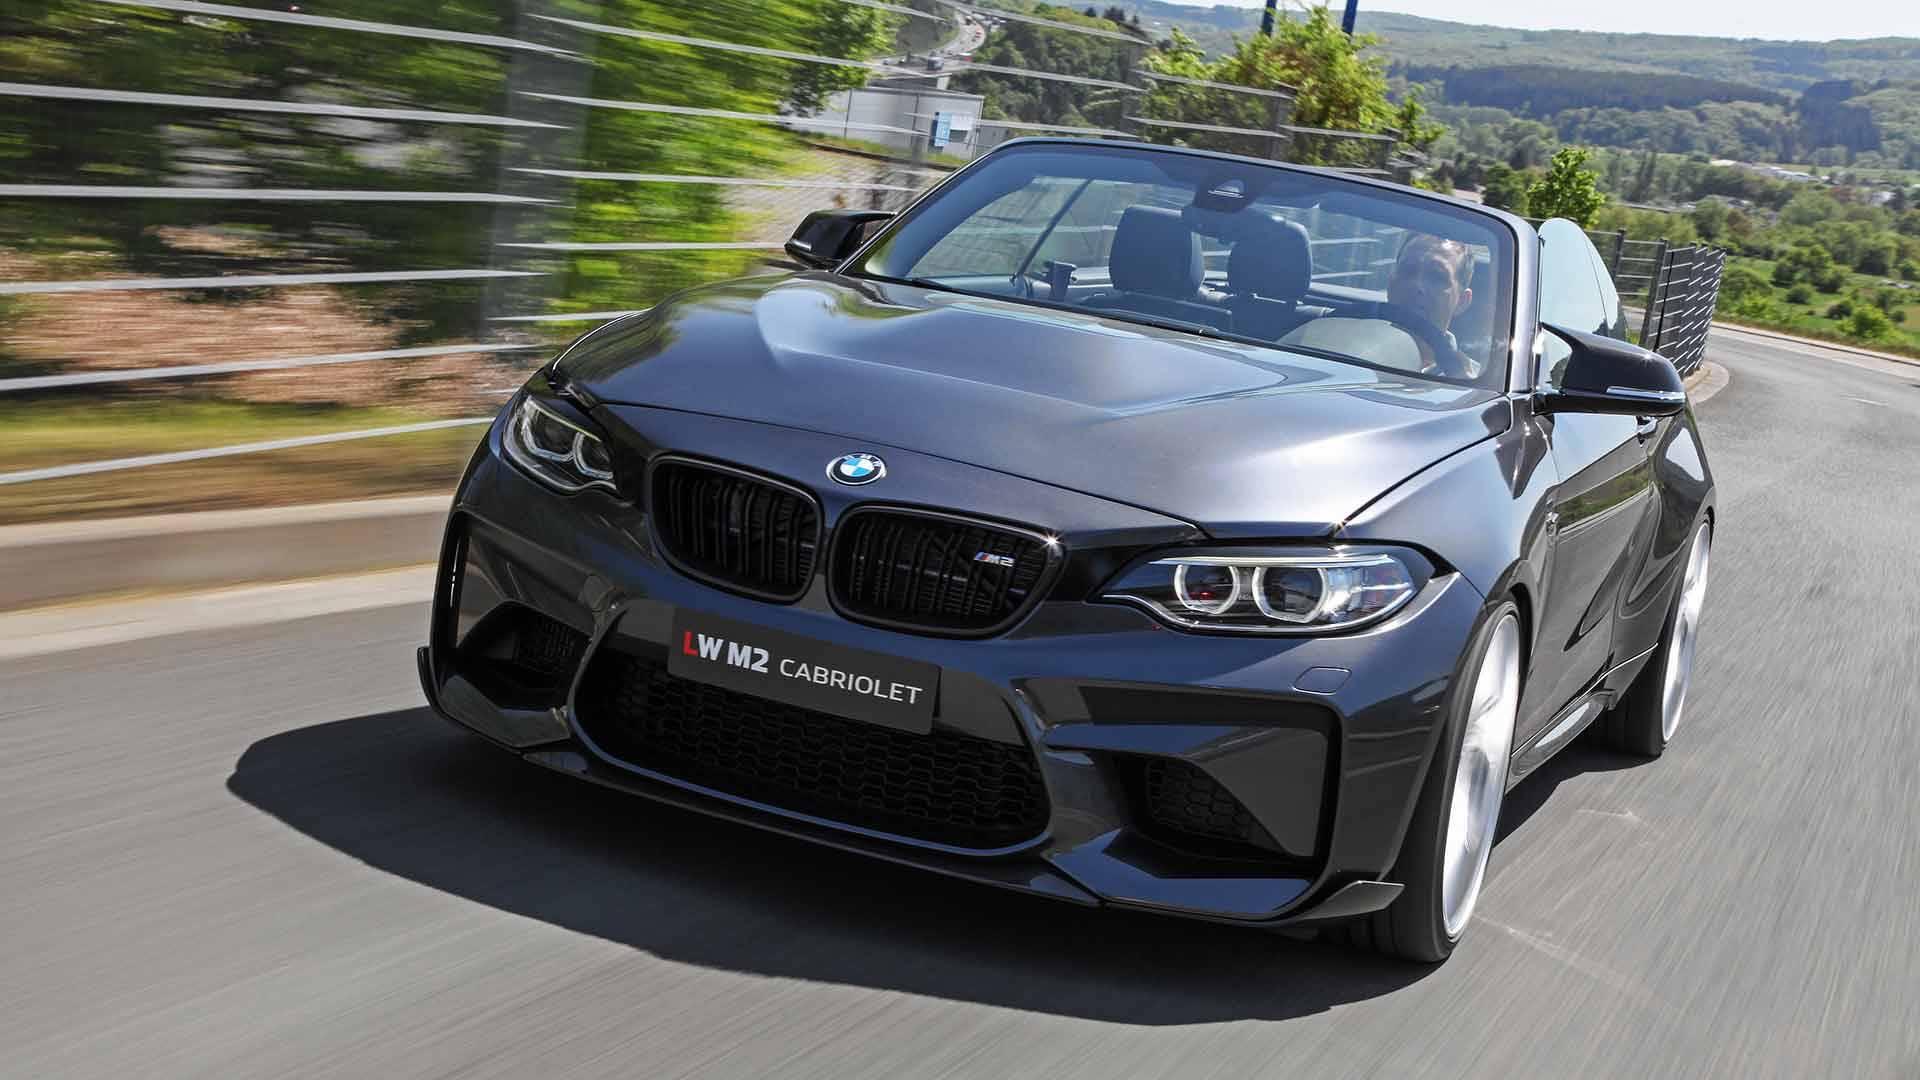 bmw-m2-cabrio-lightweight-performance- (4)